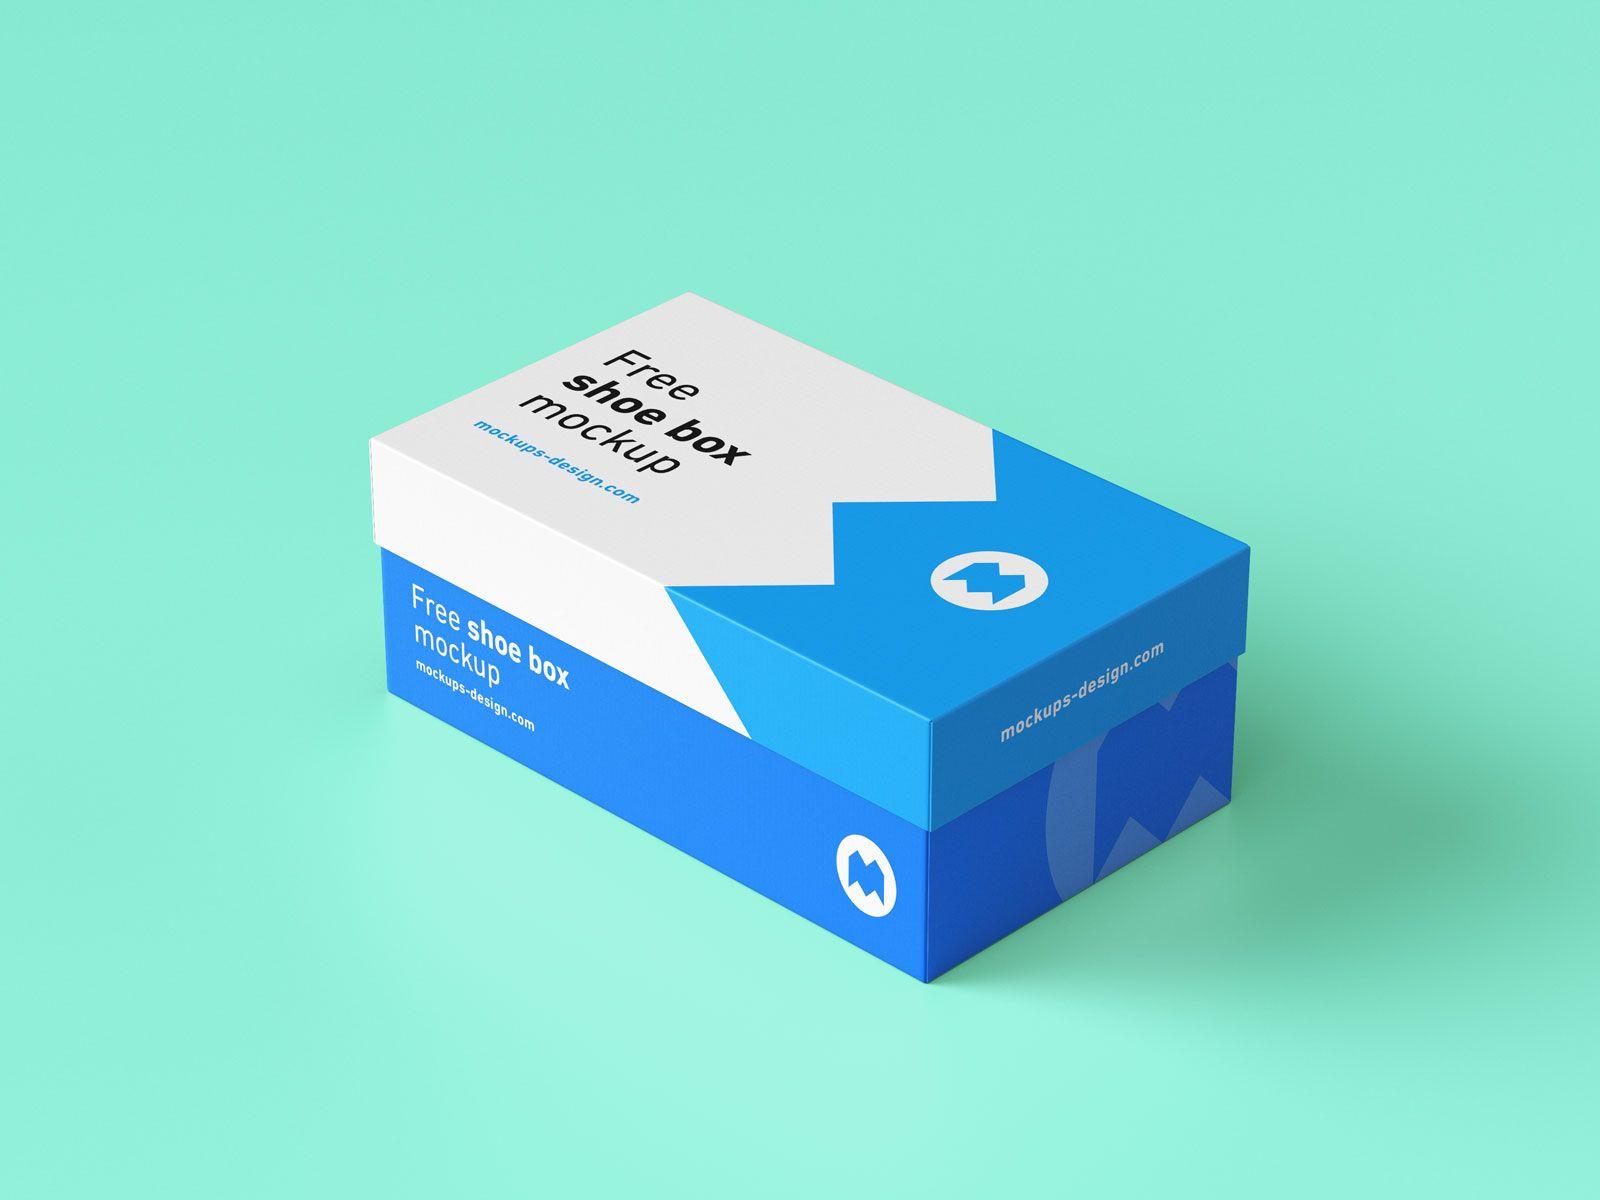 Download Free Show Box Mockup Psd File 4 Shoe Box Design Box Mockup Packaging Mockup